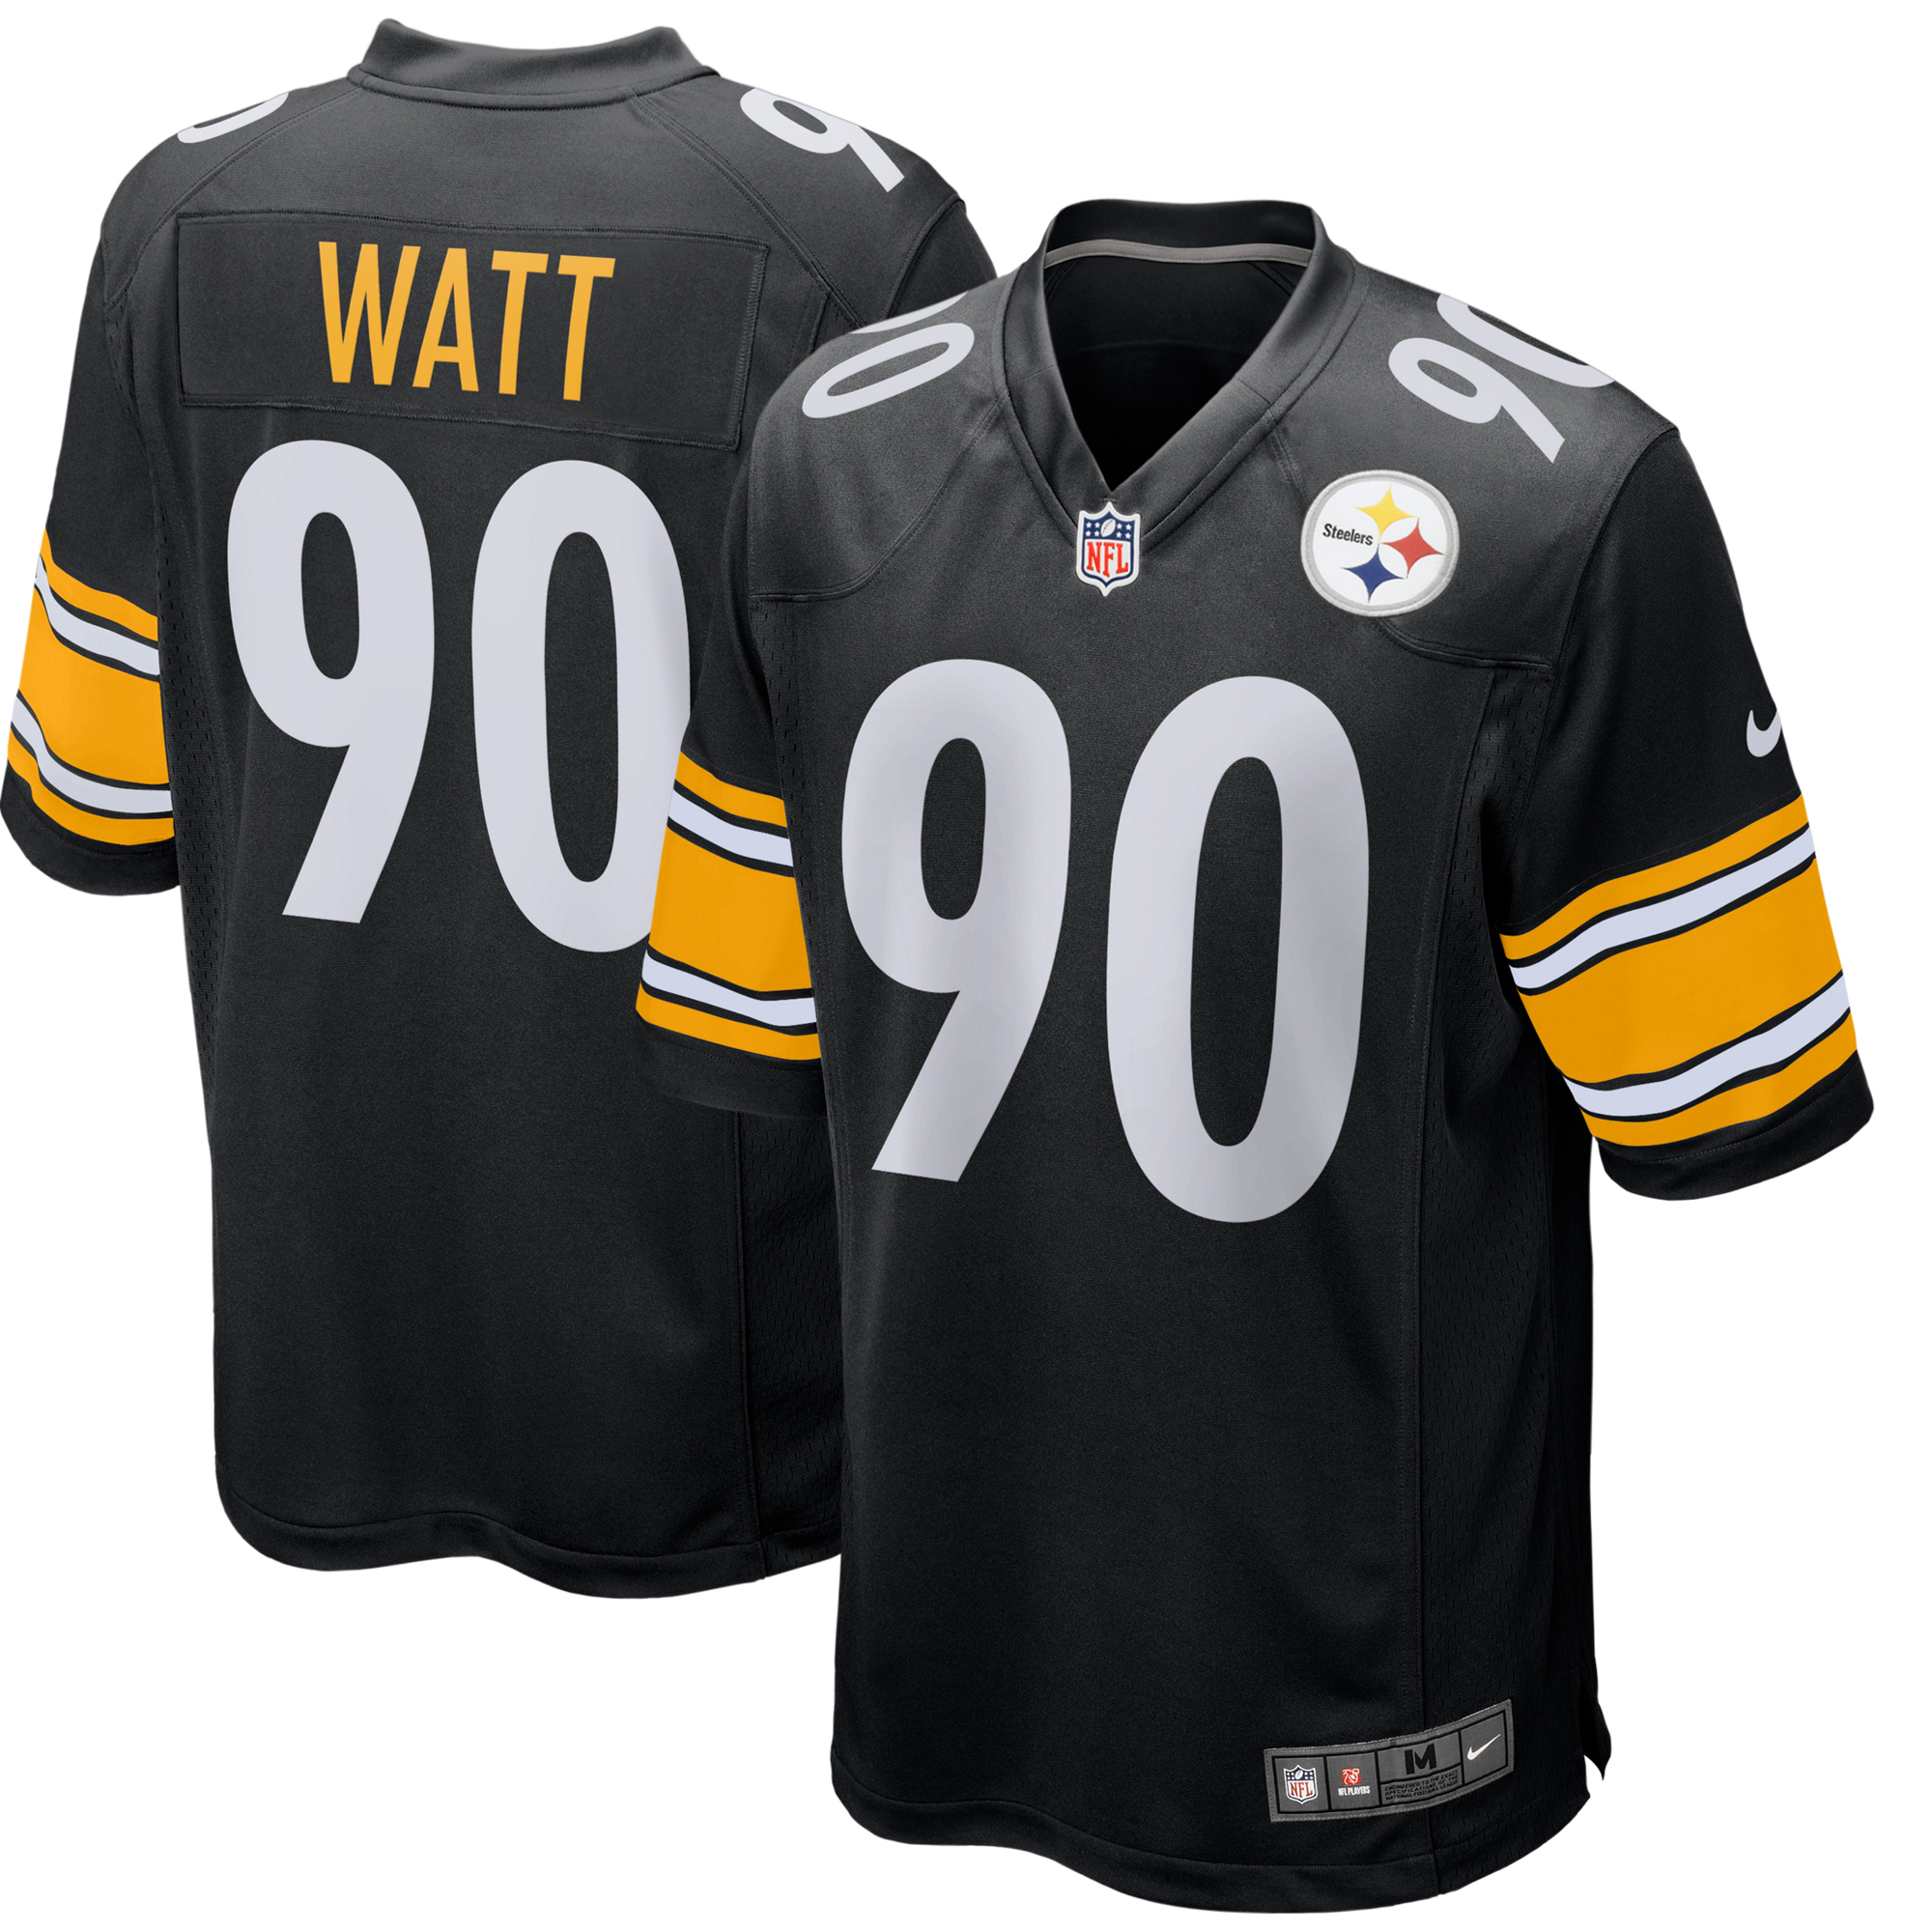 8f87cbcf9 T.J. Watt Pittsburgh Steelers Nike Game Jersey - Black - Walmart.com